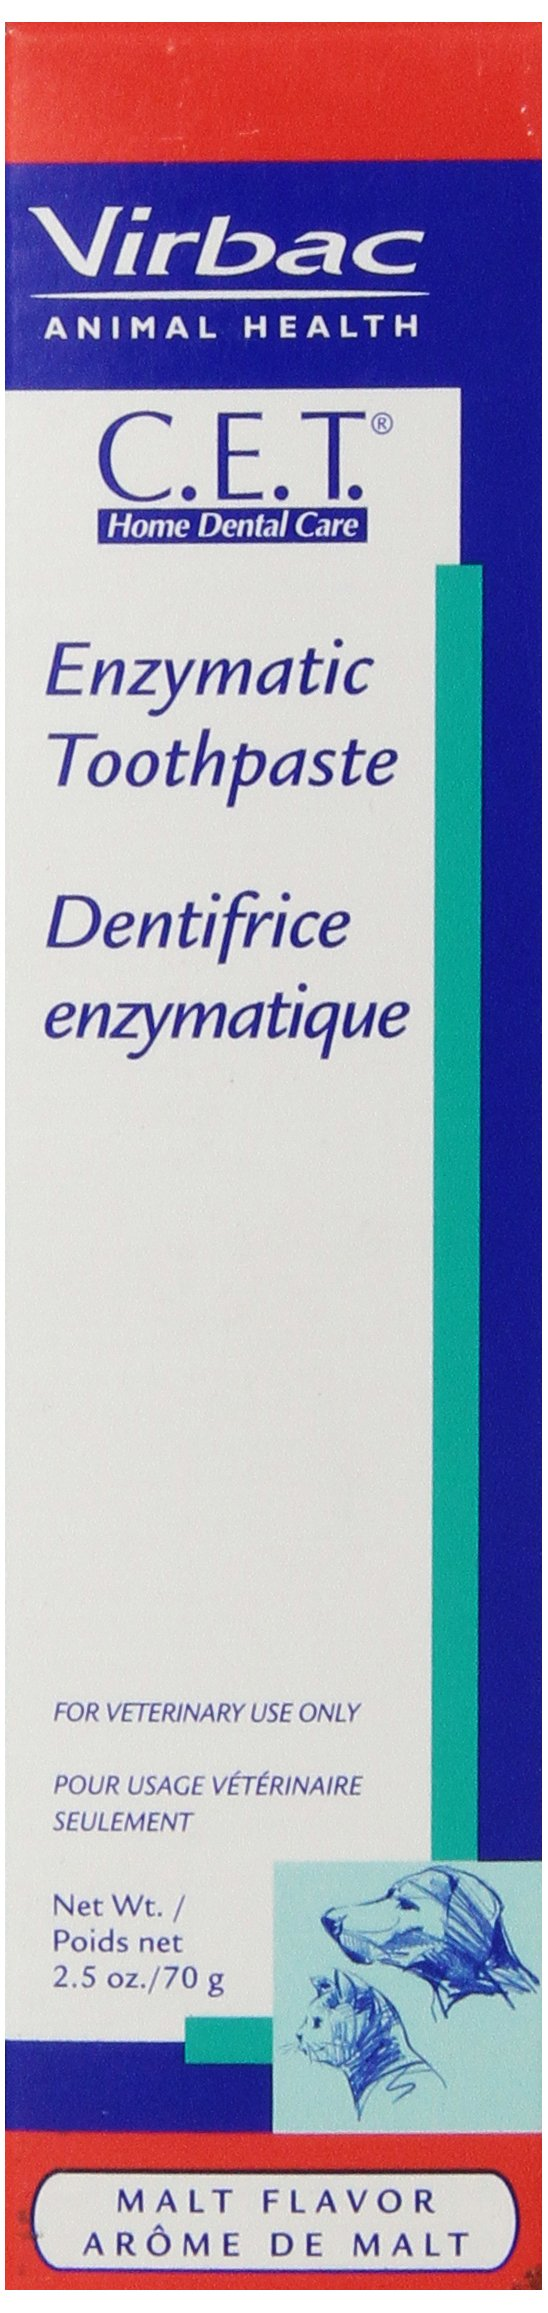 Virbac C.E.T. Enzymatic Toothpaste, Malt Flavor, 2.5 oz by Virbac